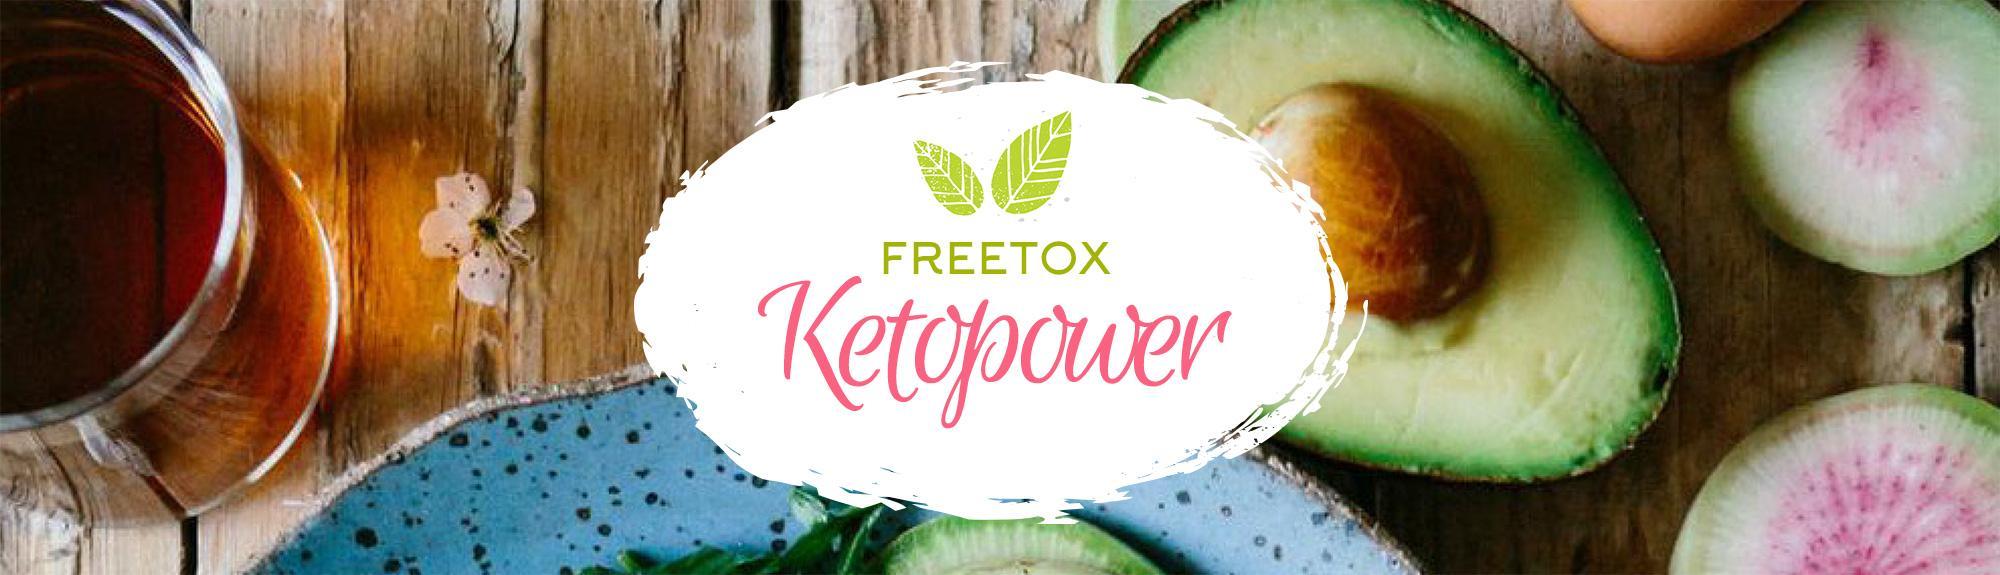 Freetox Ketopower